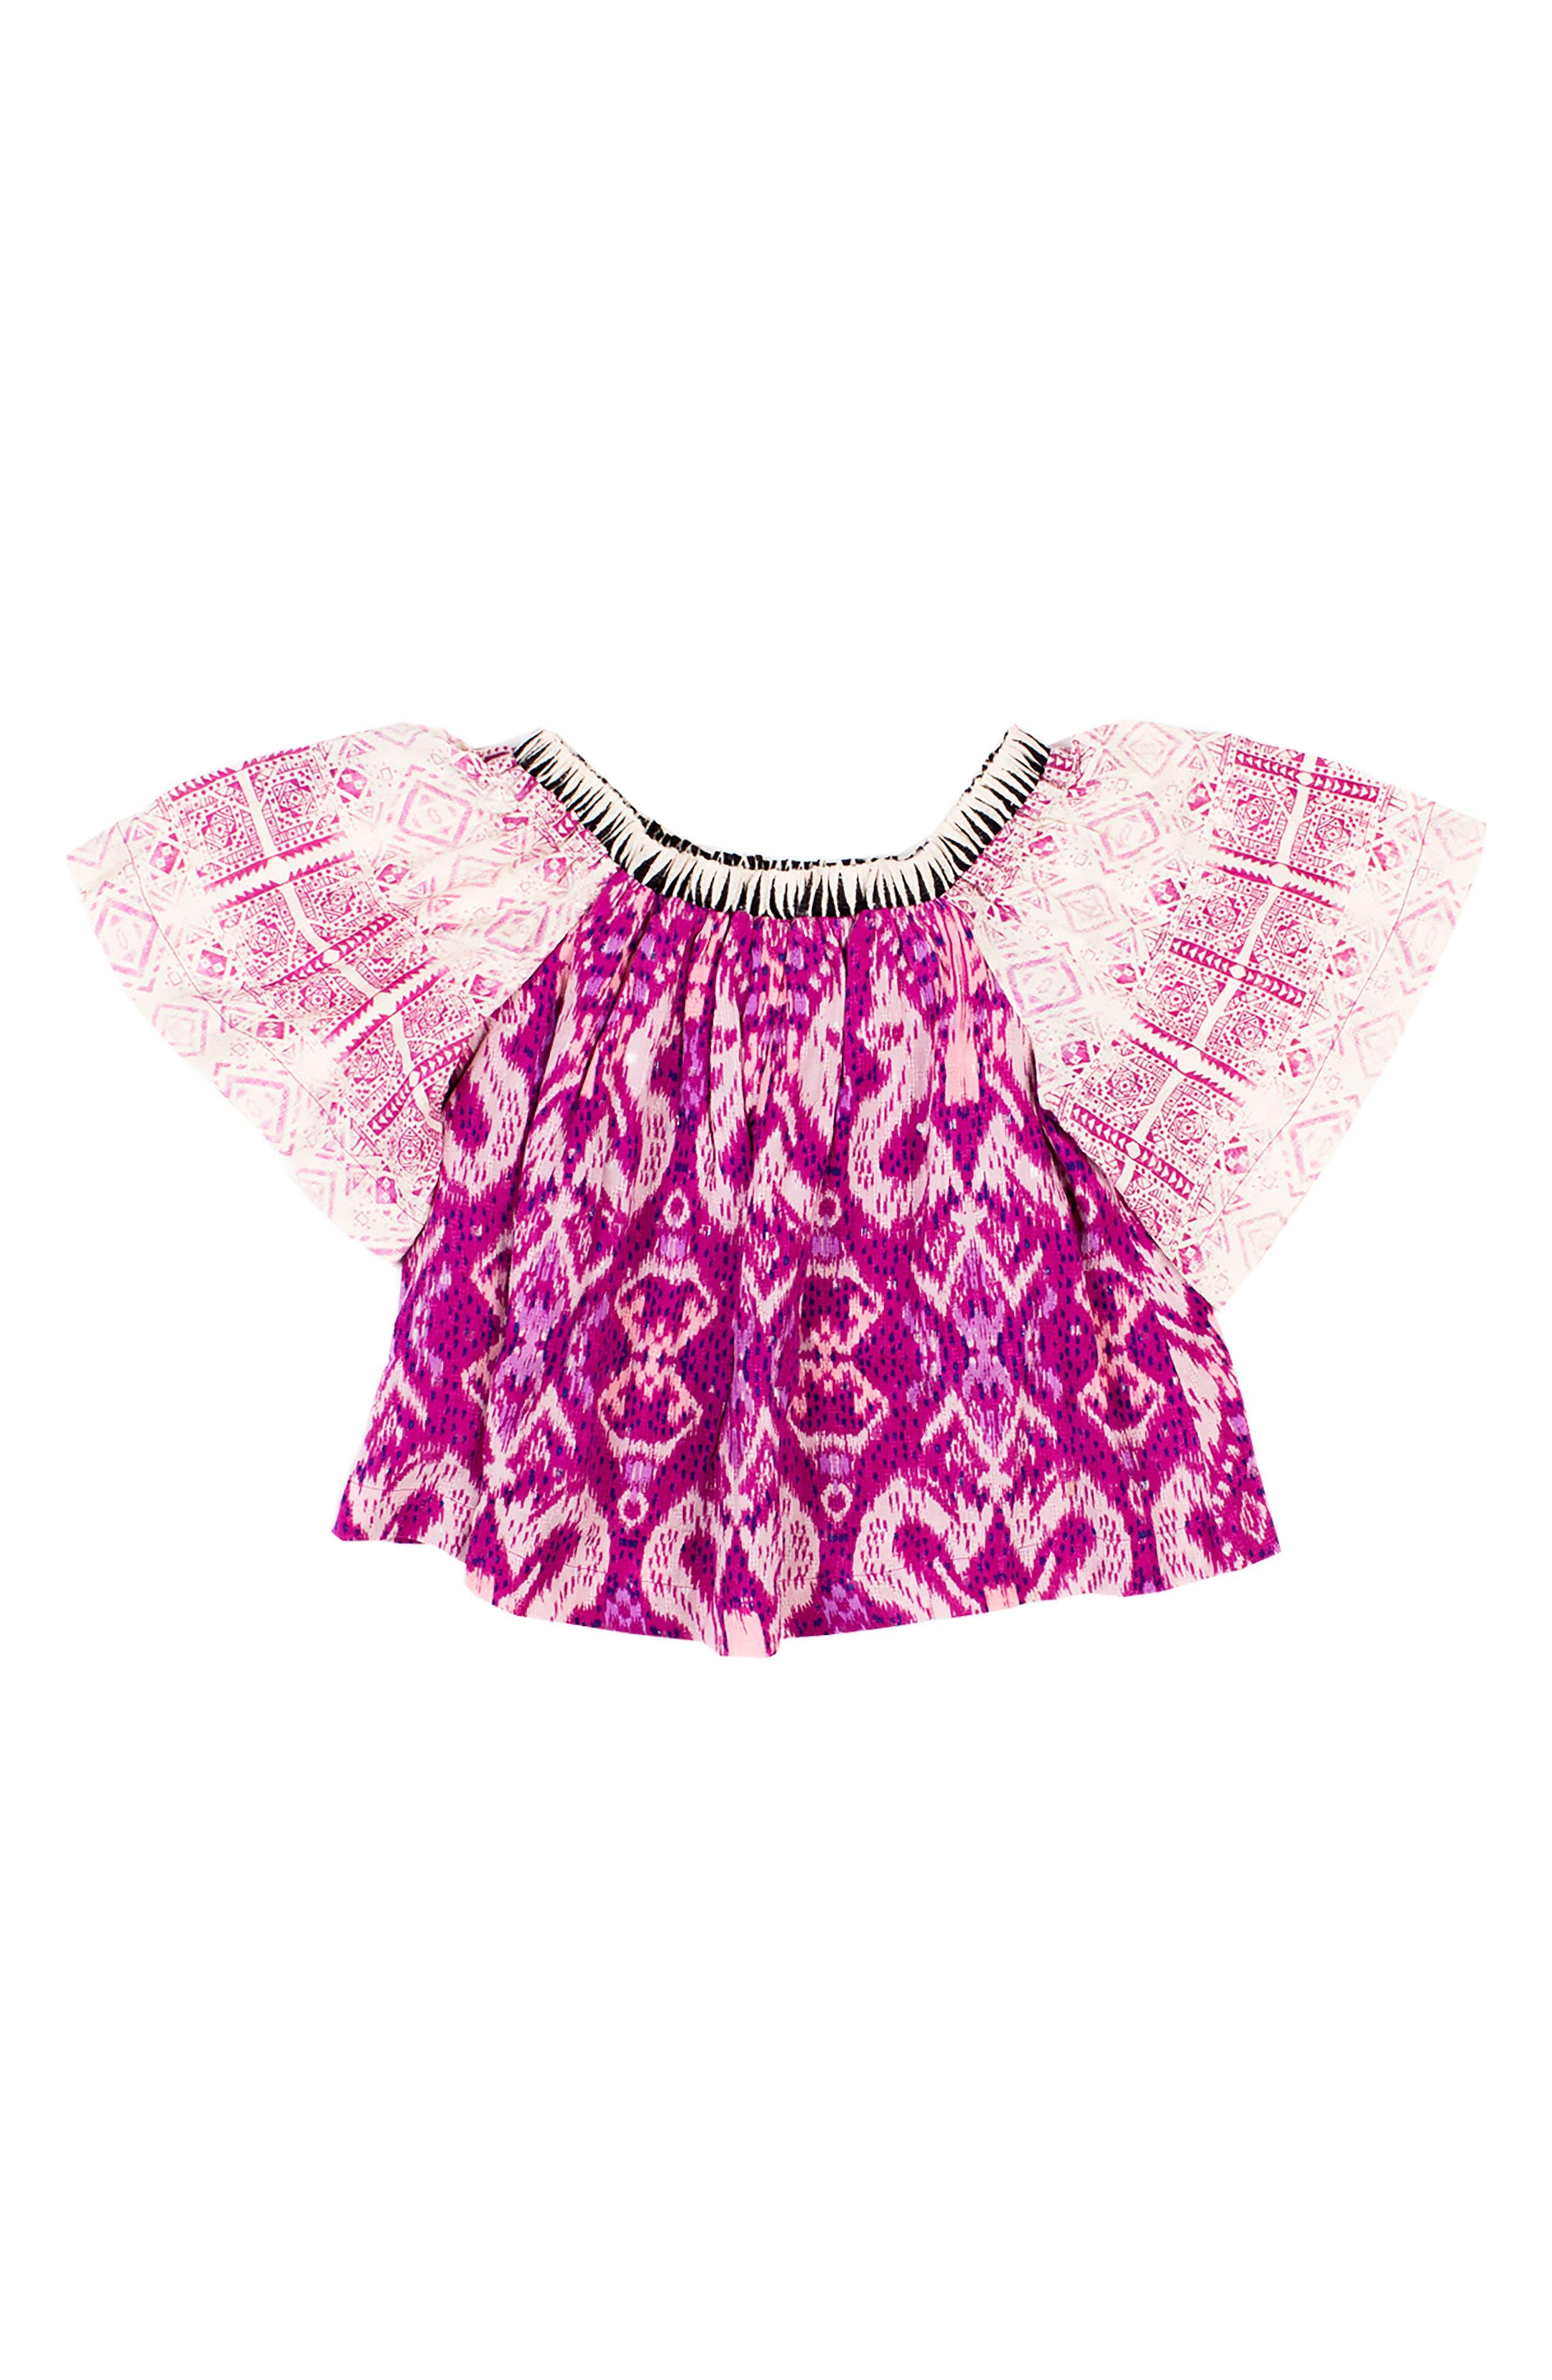 Main Image - BOWIE X JAMES Milky Way Flutter Sleeve Top (Toddler Girls, Little Girls and Big Girls)